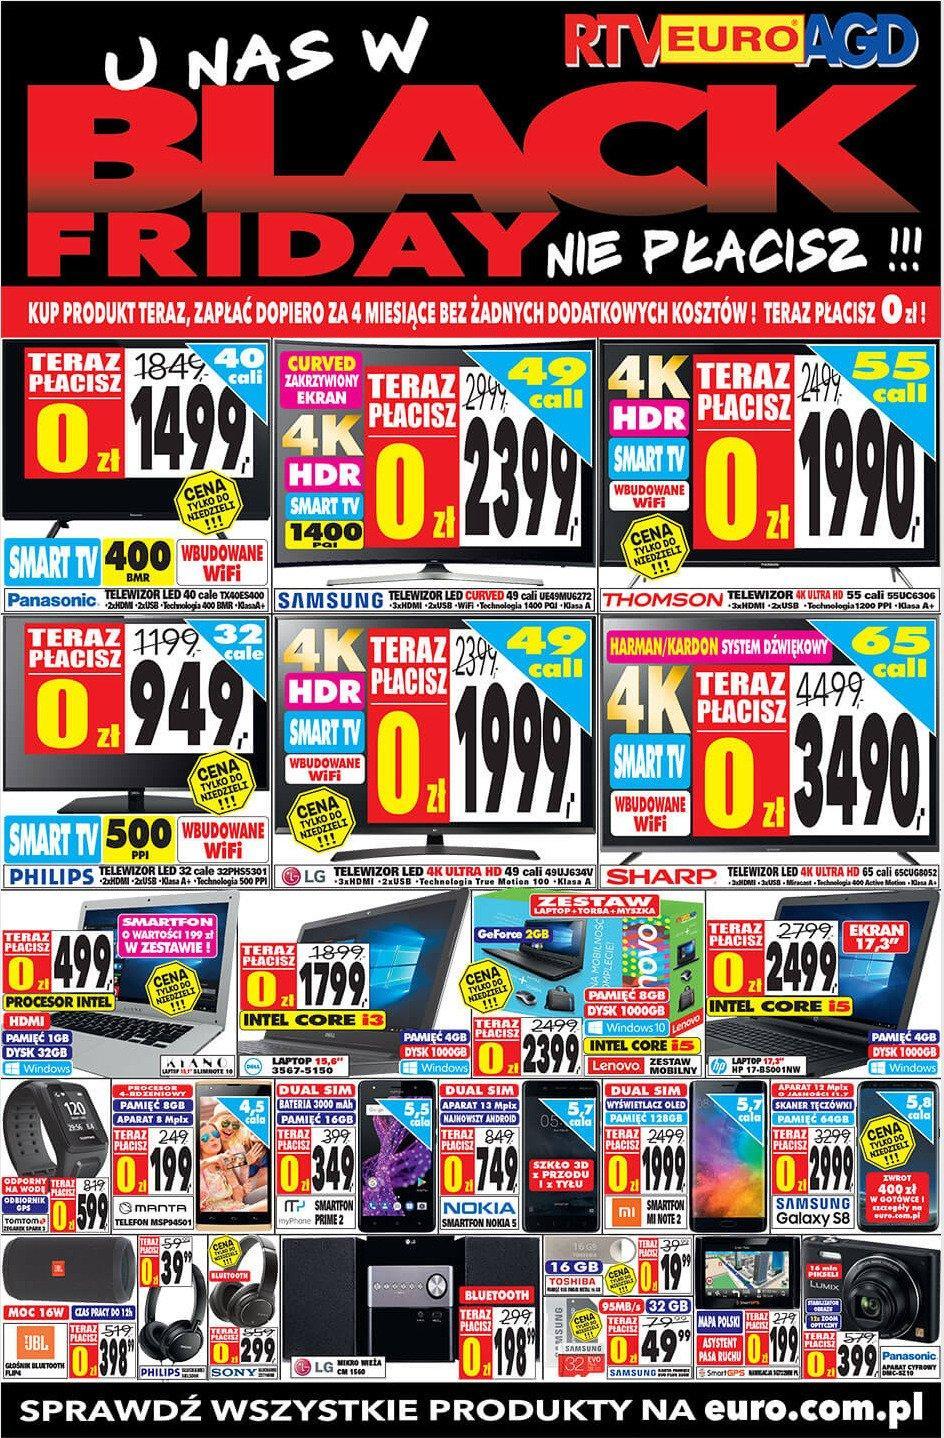 Gazetka promocyjna RTV Euro AGD do 26/11/2017 str.0